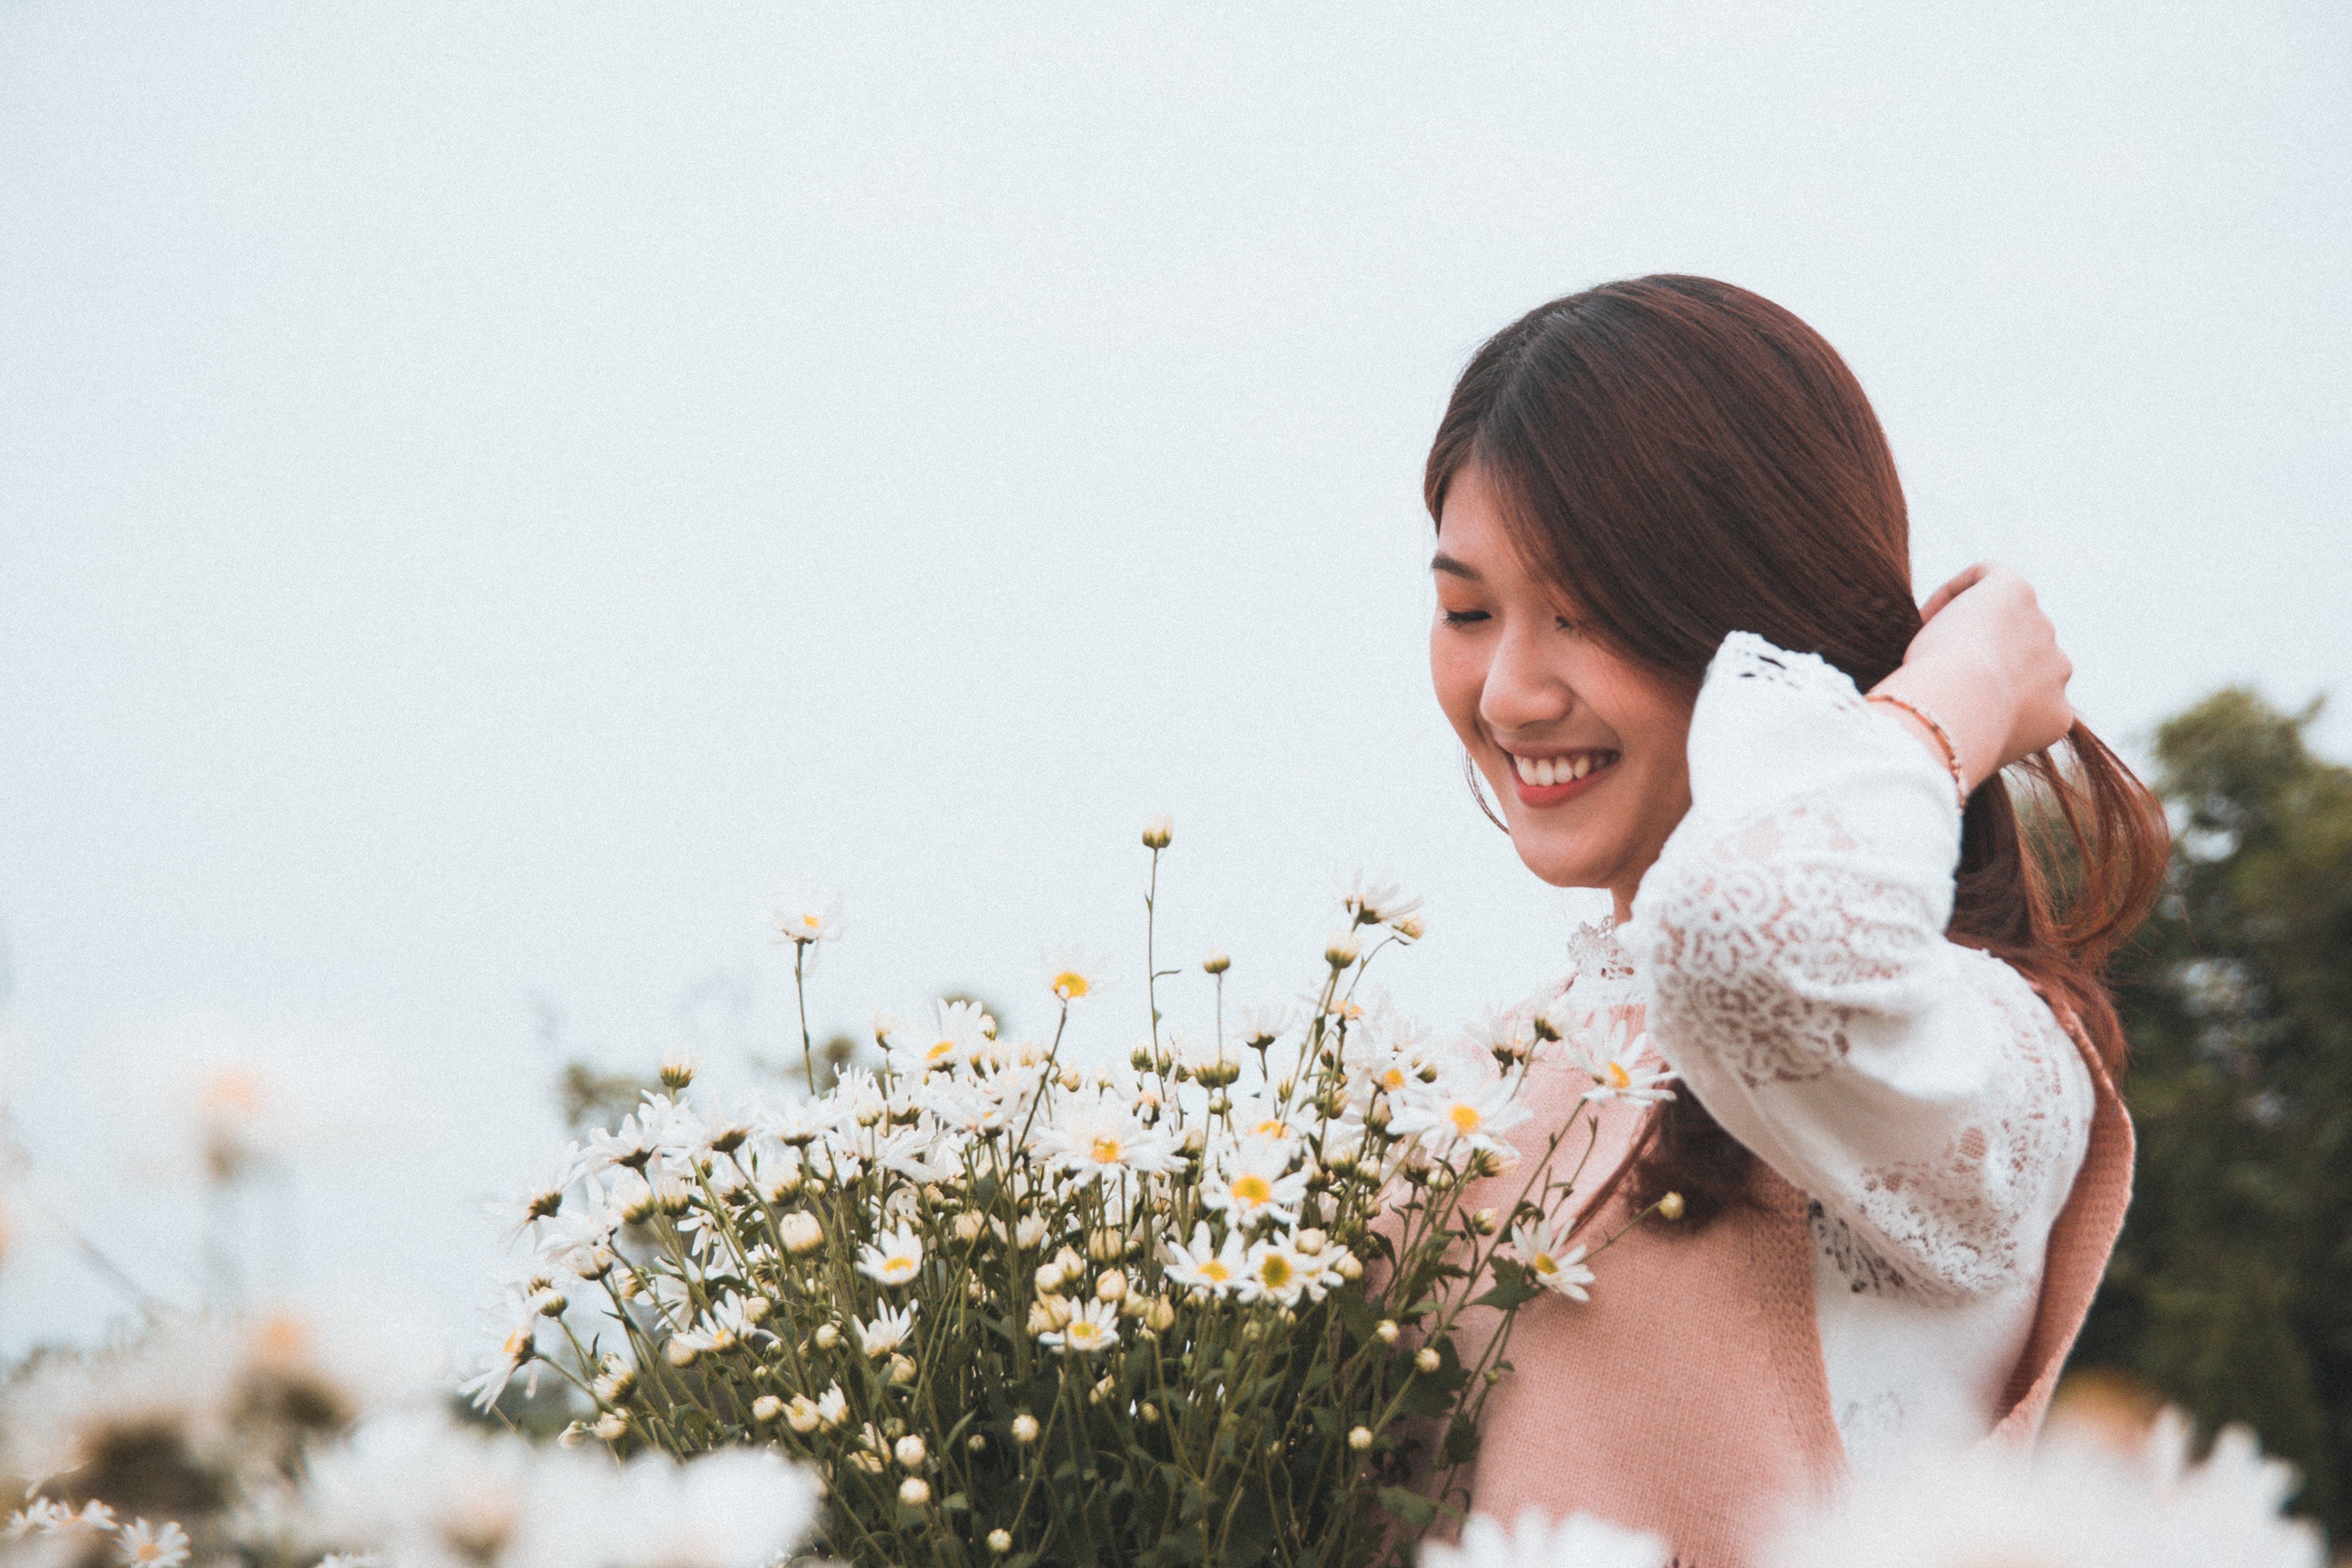 Woman Smiling Near Flowers